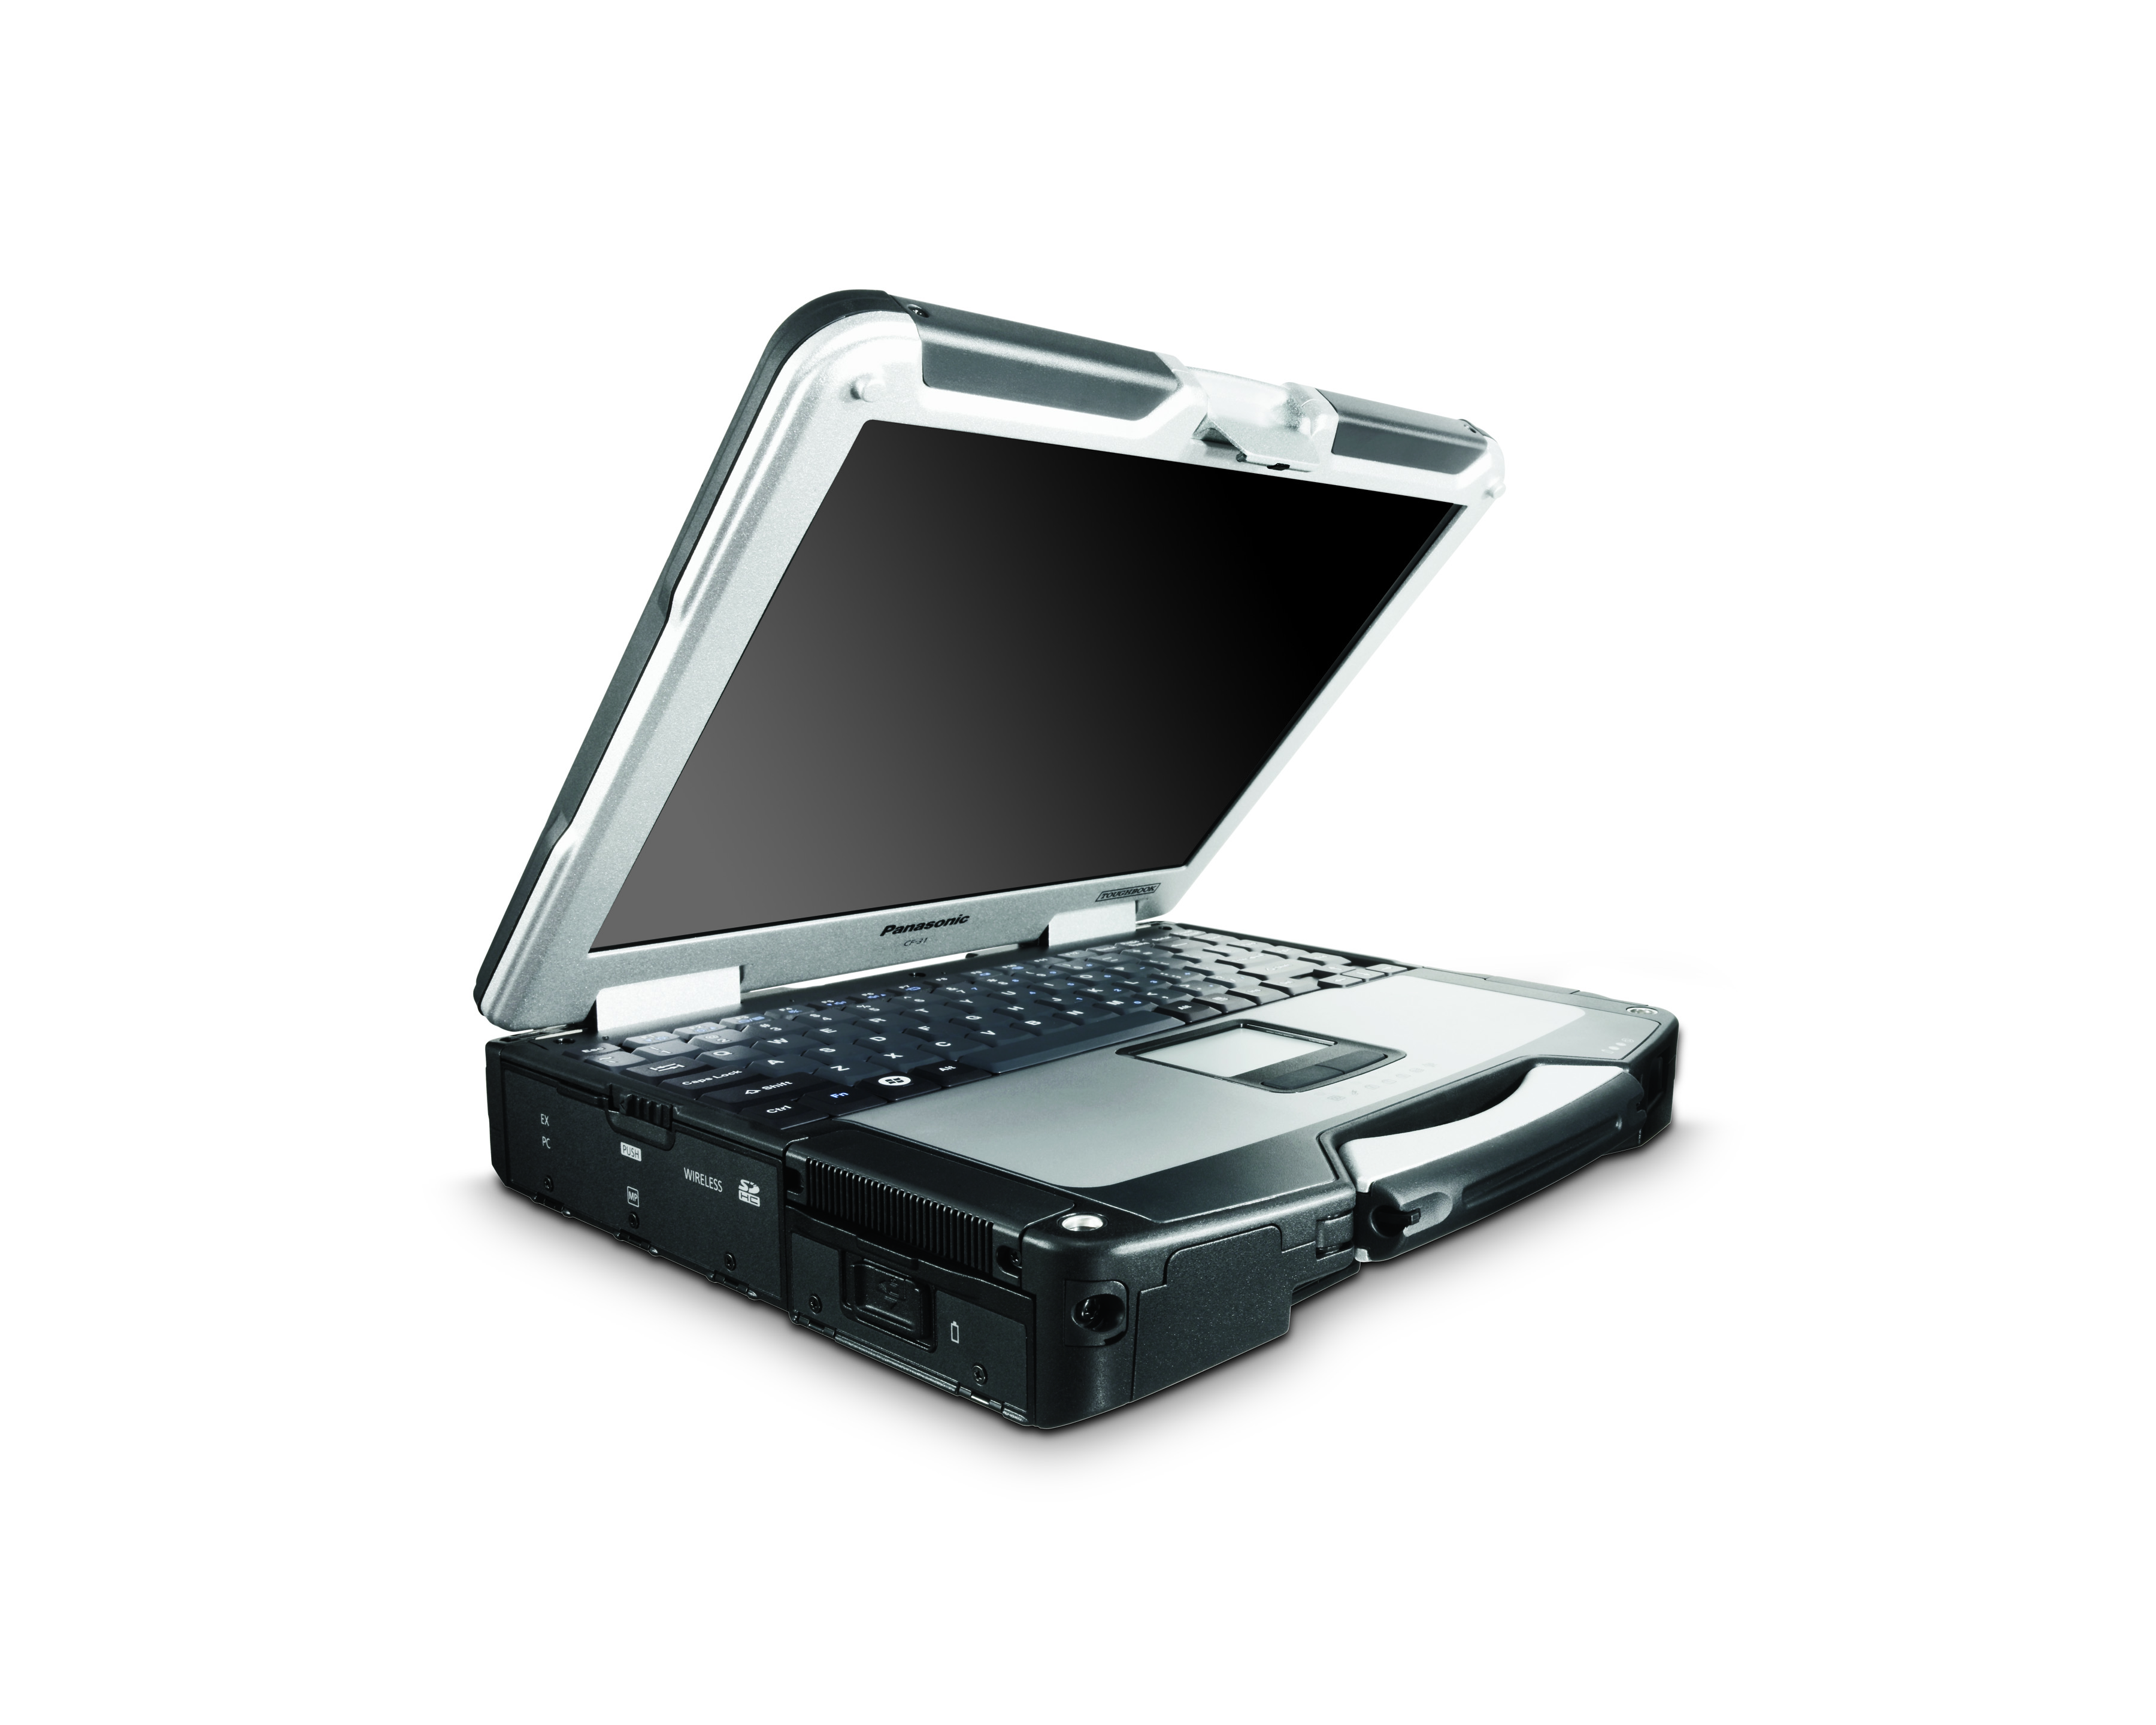 Rugged Notebook Panasonic Toughbook